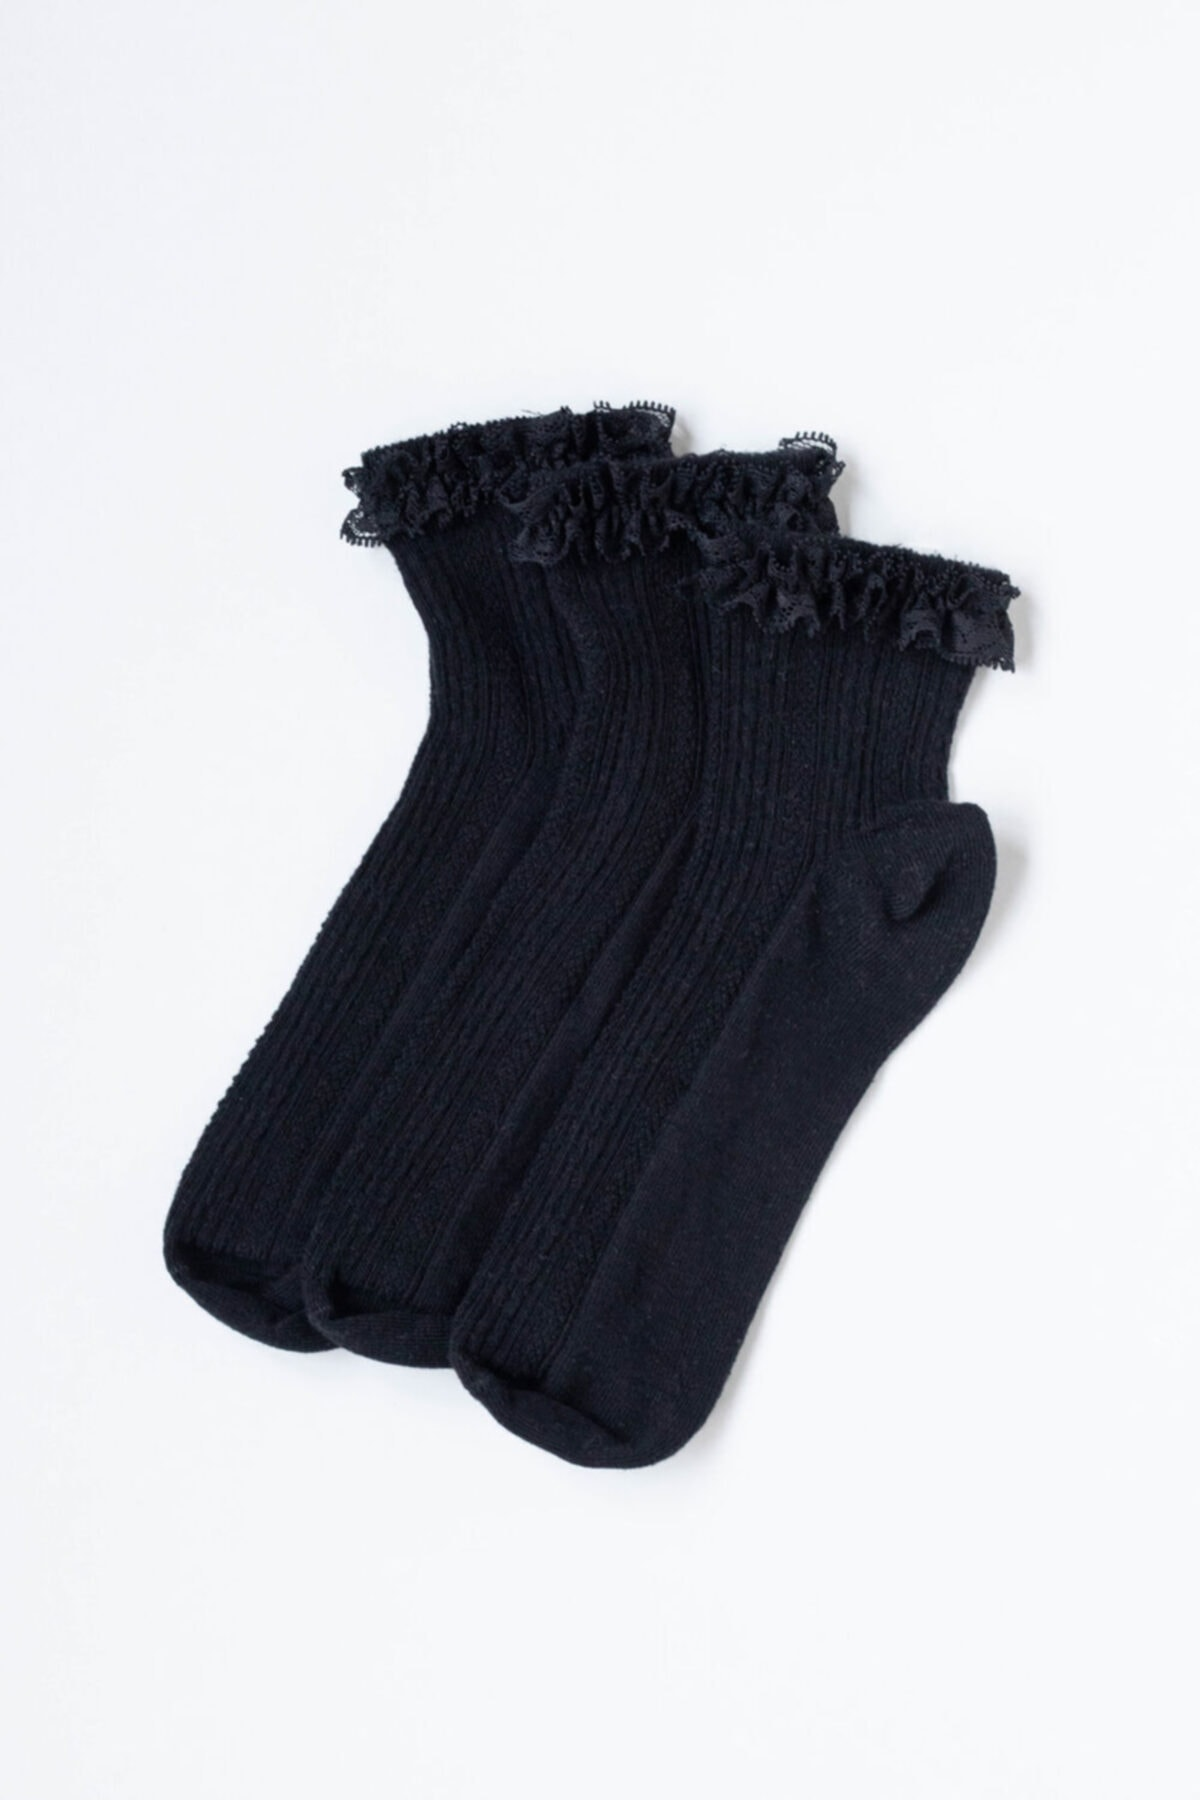 Katia&Bony 3'lü Paket Fırfırlı Kadın Çorap - Siyah /siyah / Siyah 2